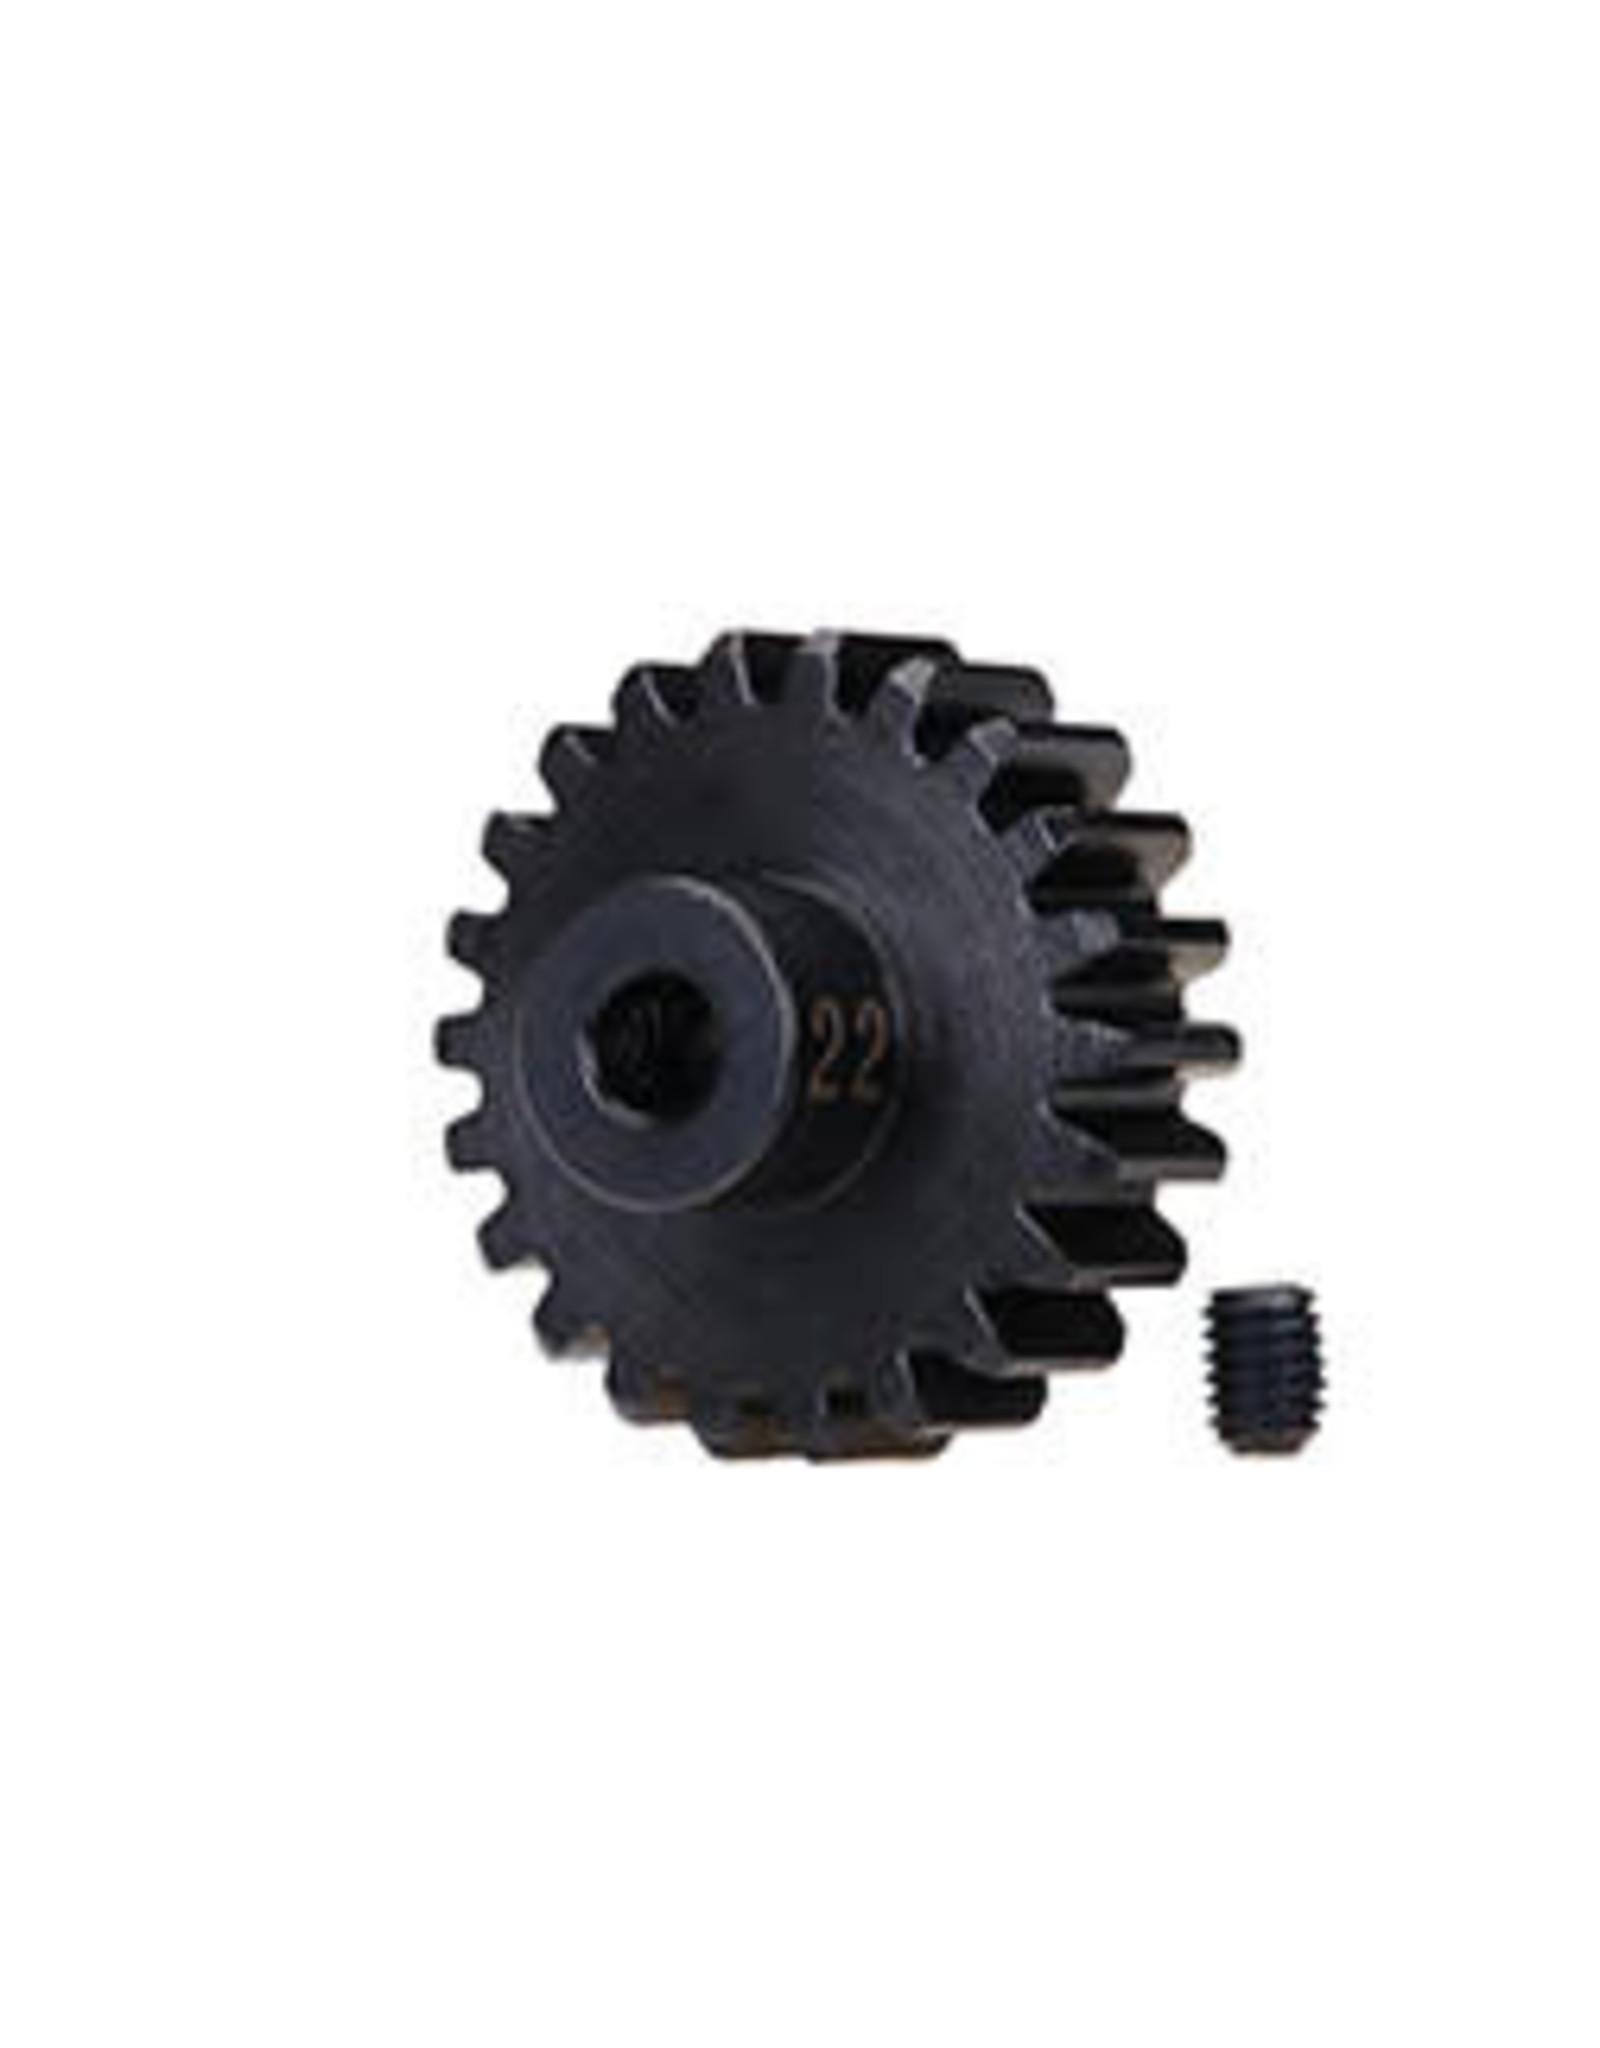 Traxxas [Gear, 22-T pinion (32-p), heavy duty (machined, hardened steel)/ set screw] Gear, 22-T pinion (32-p), heavy duty (machined, hardened steel)/ set screw